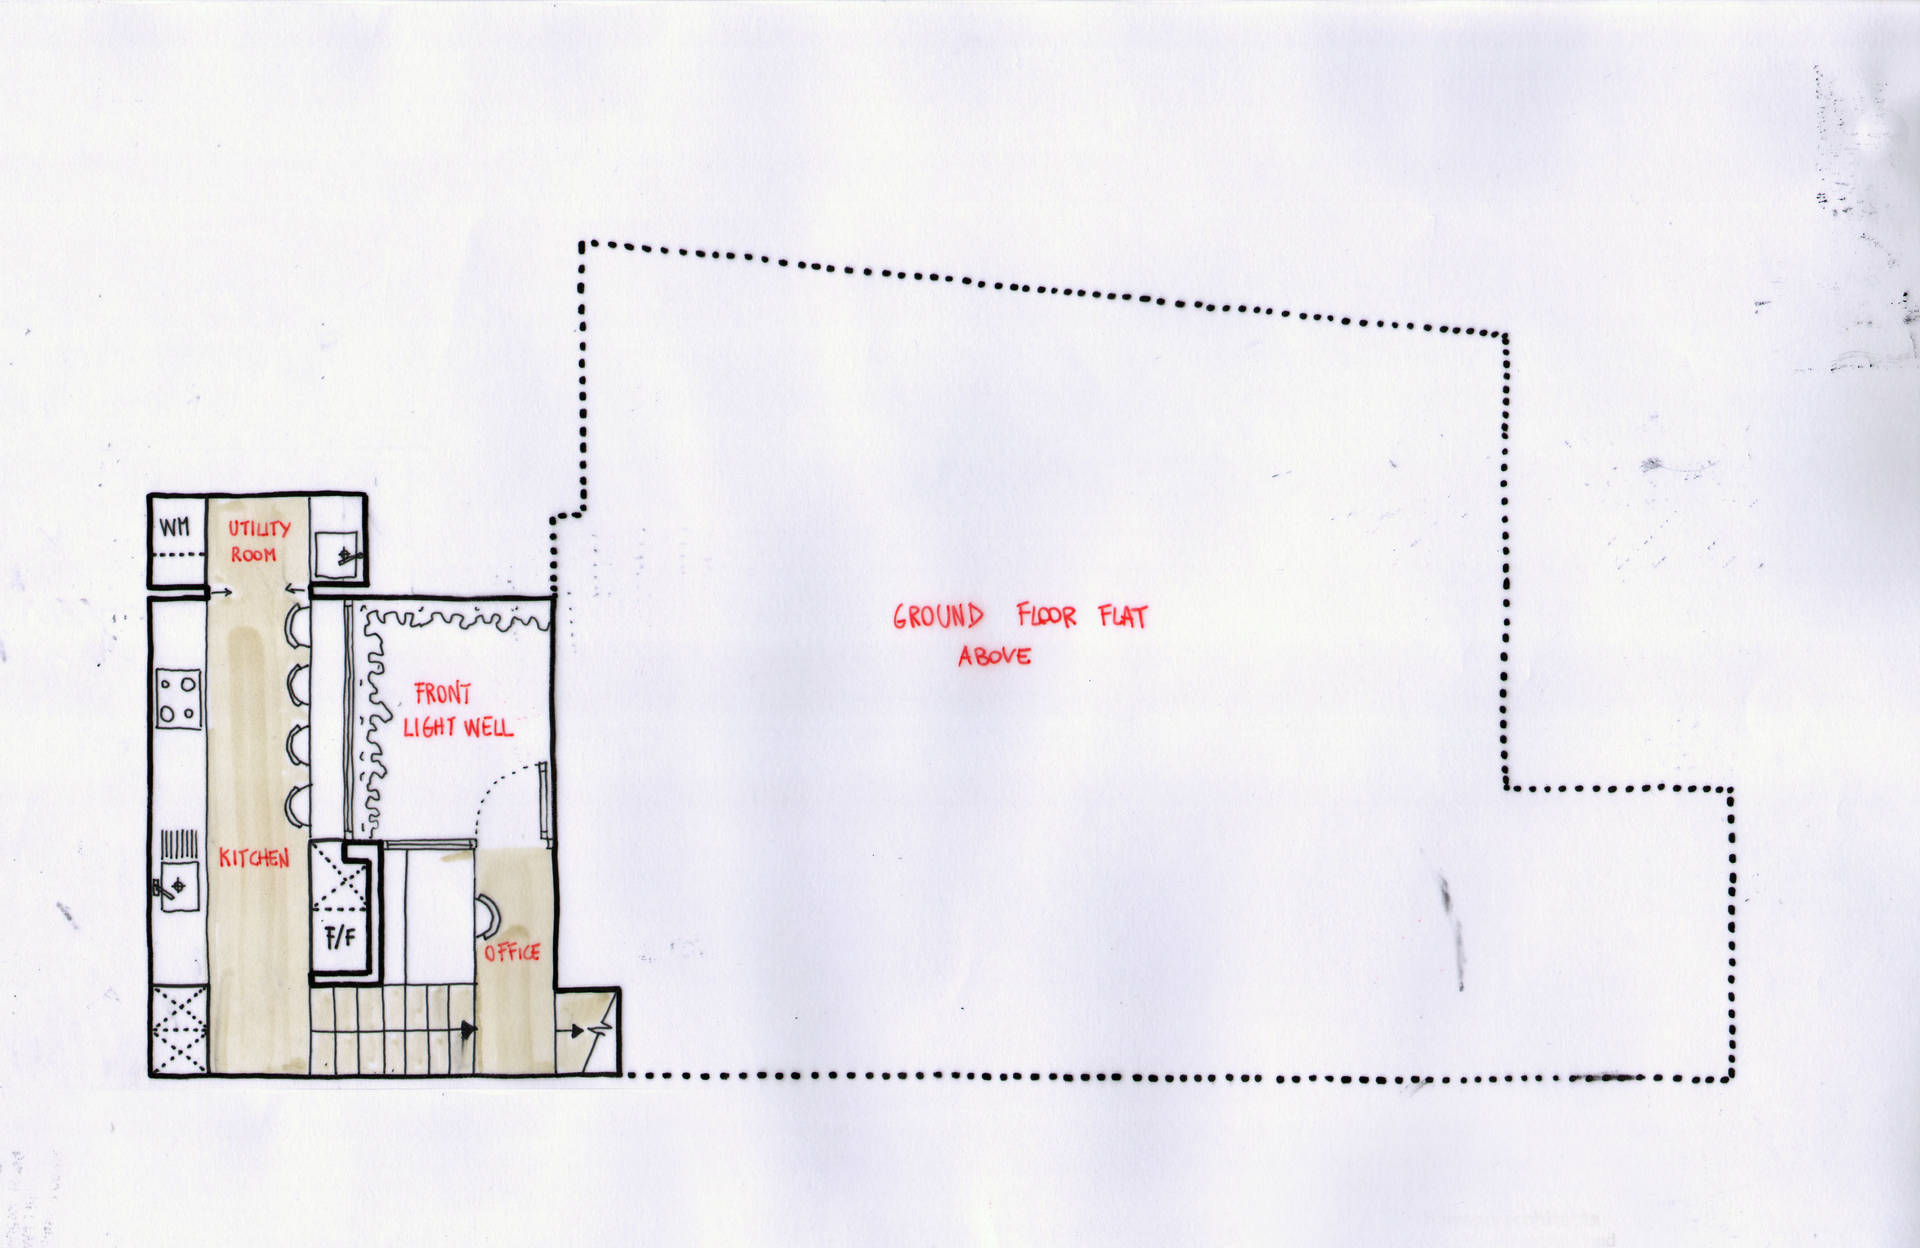 527-LGF Sketch.jpg